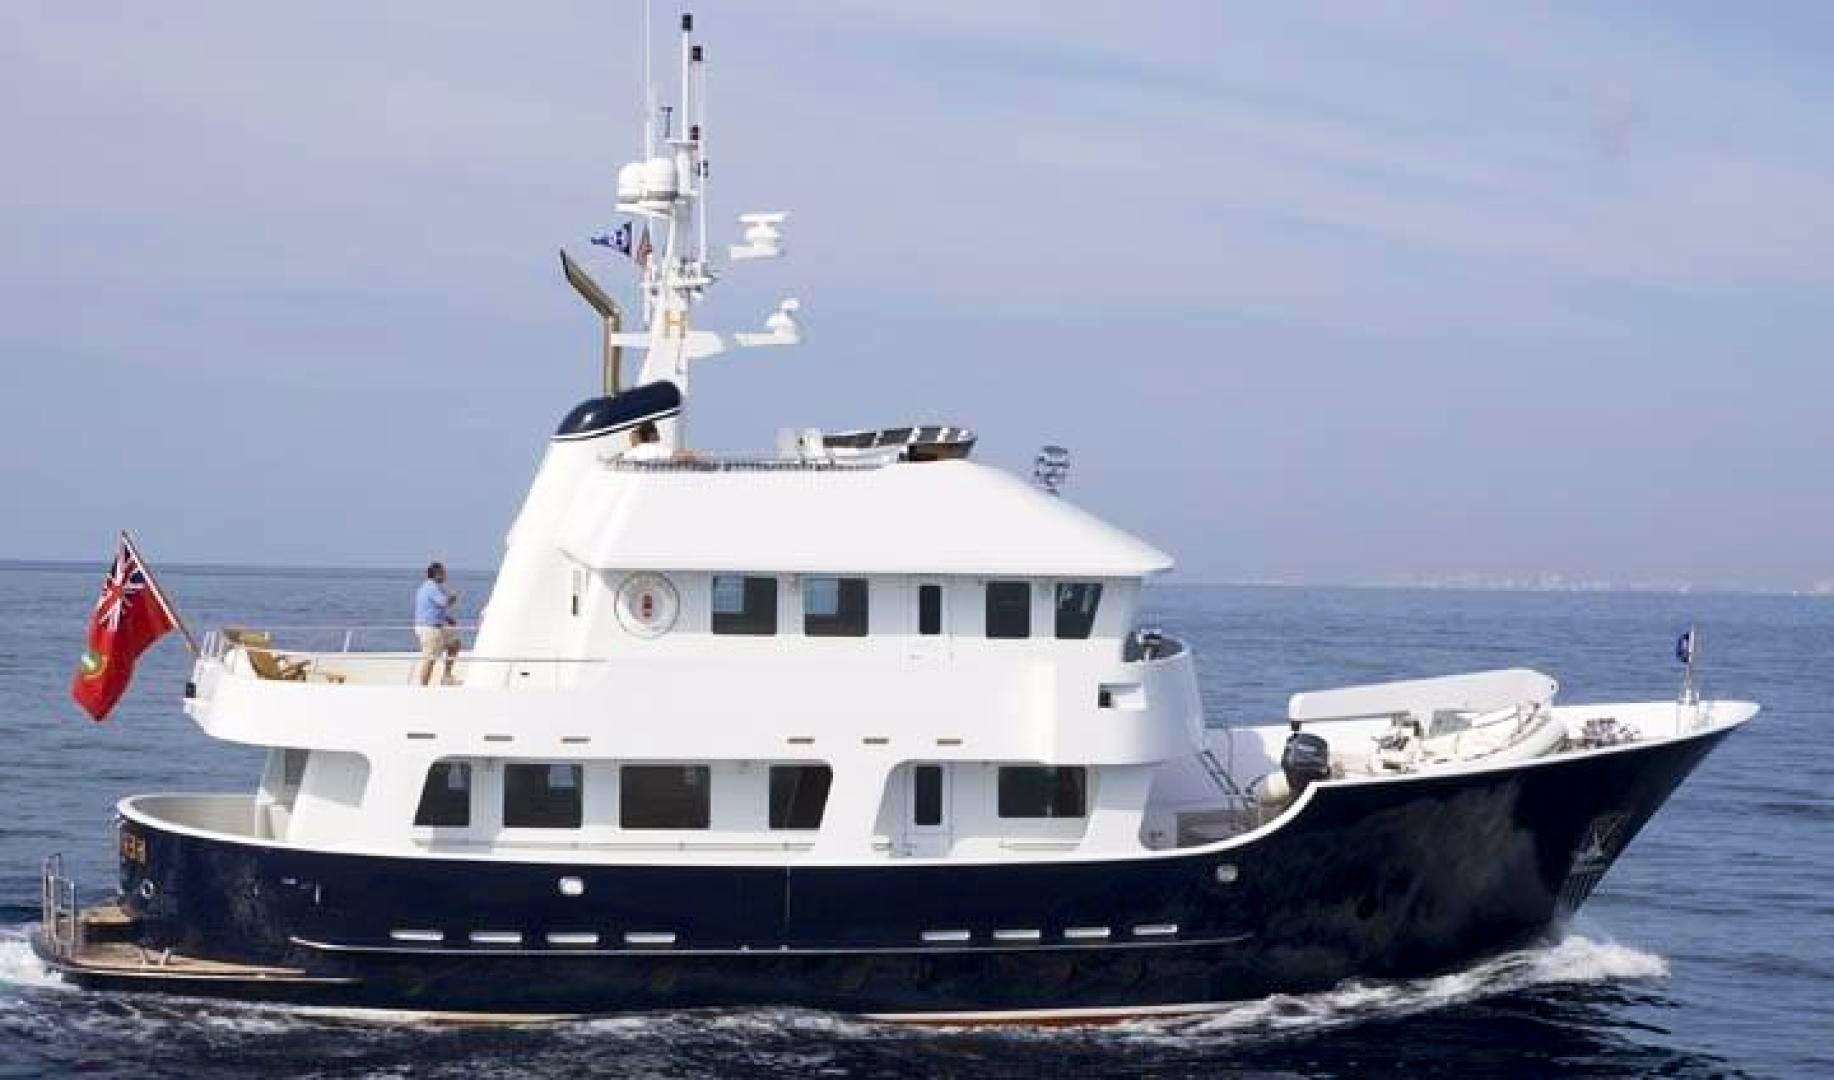 HERCULES Yacht for Sale | 75 Molokai Strait 2006